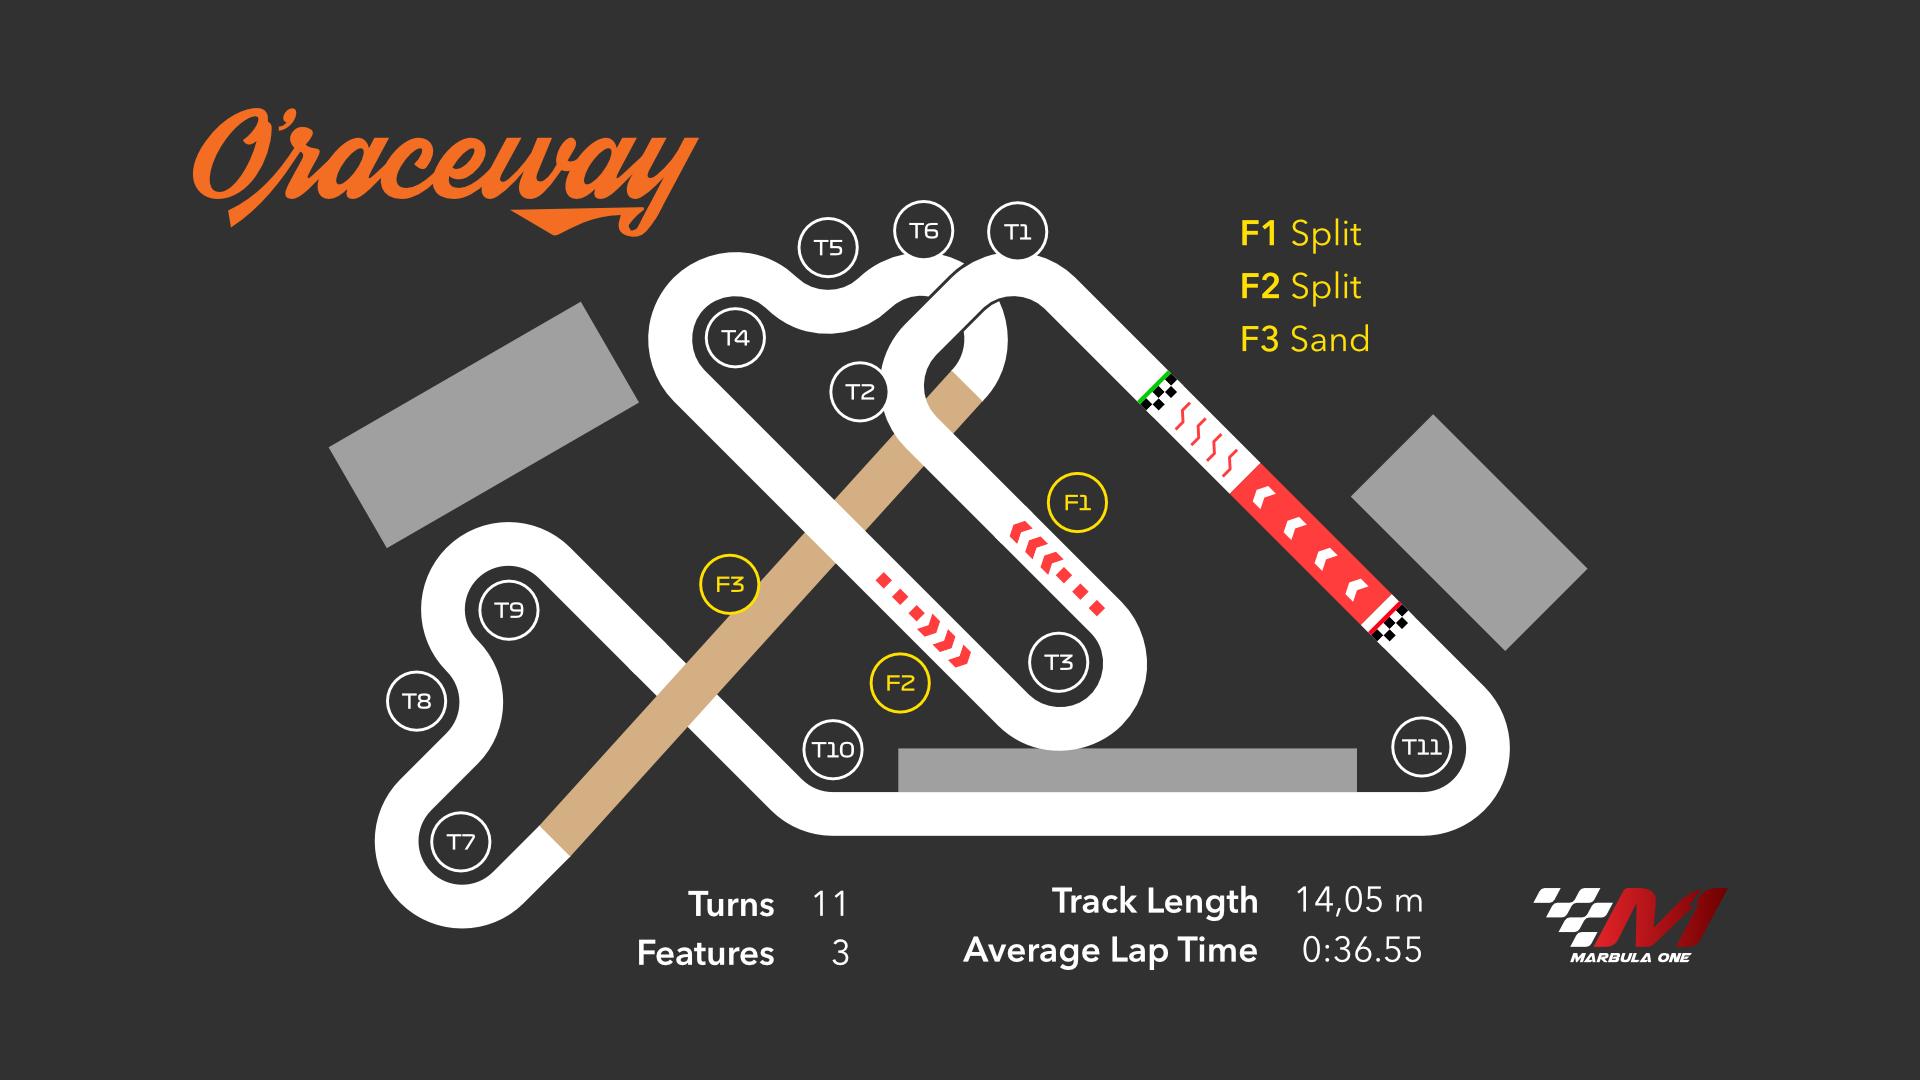 O'raceway